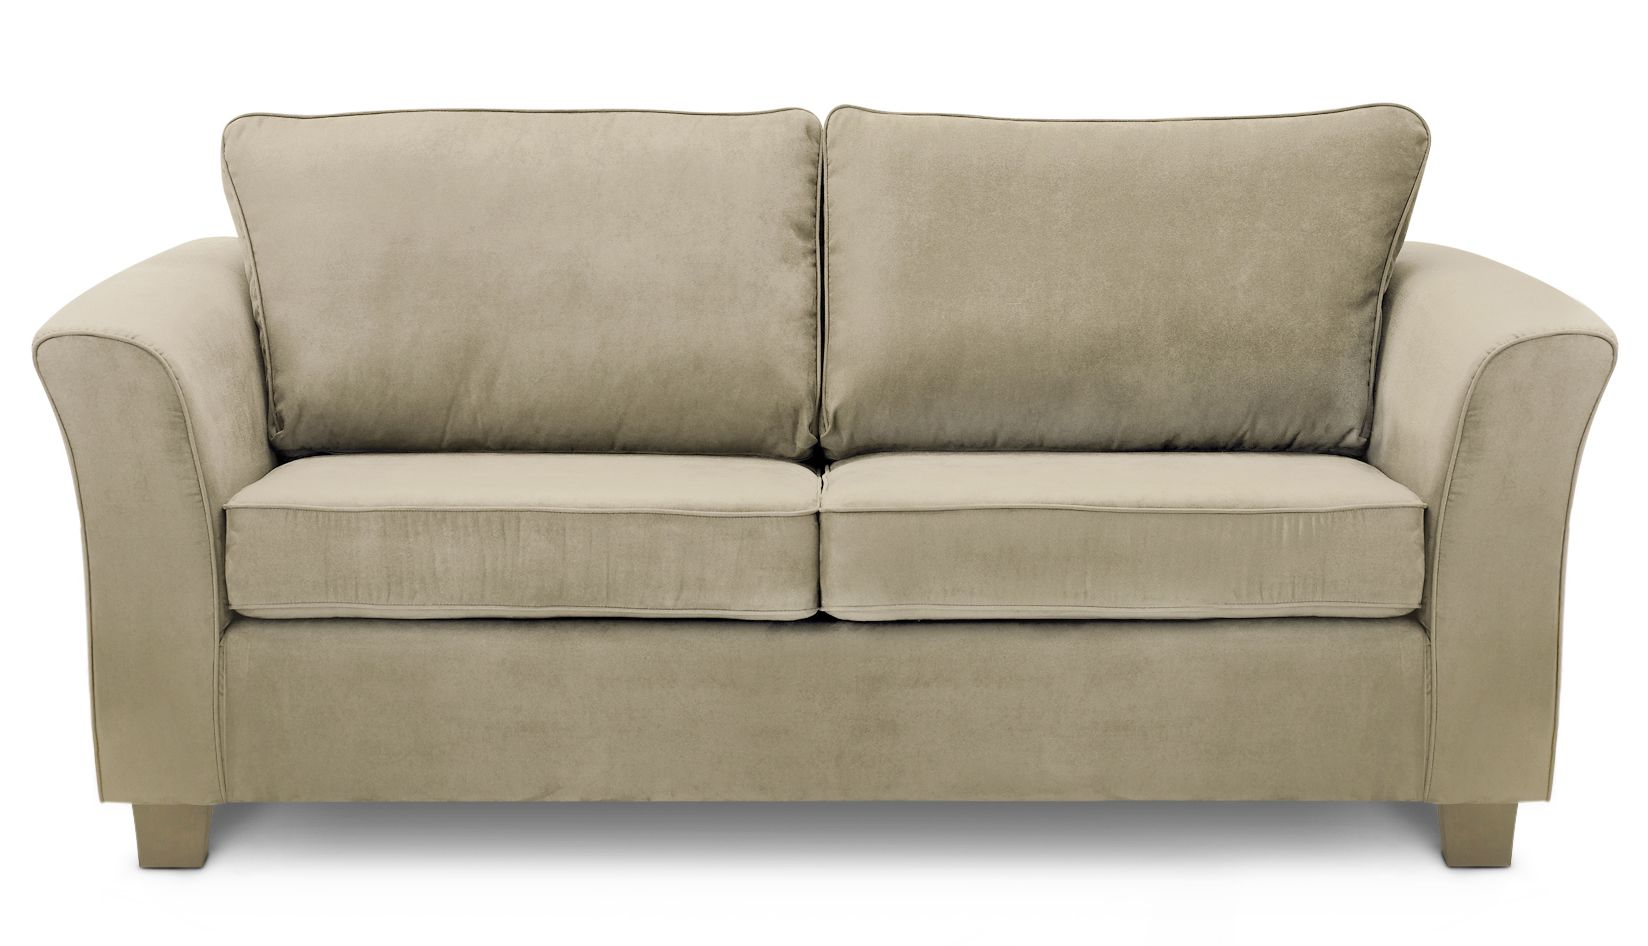 sleeper sofa black friday 2017 colonial ow149 2 ikea set blue interior design ideas